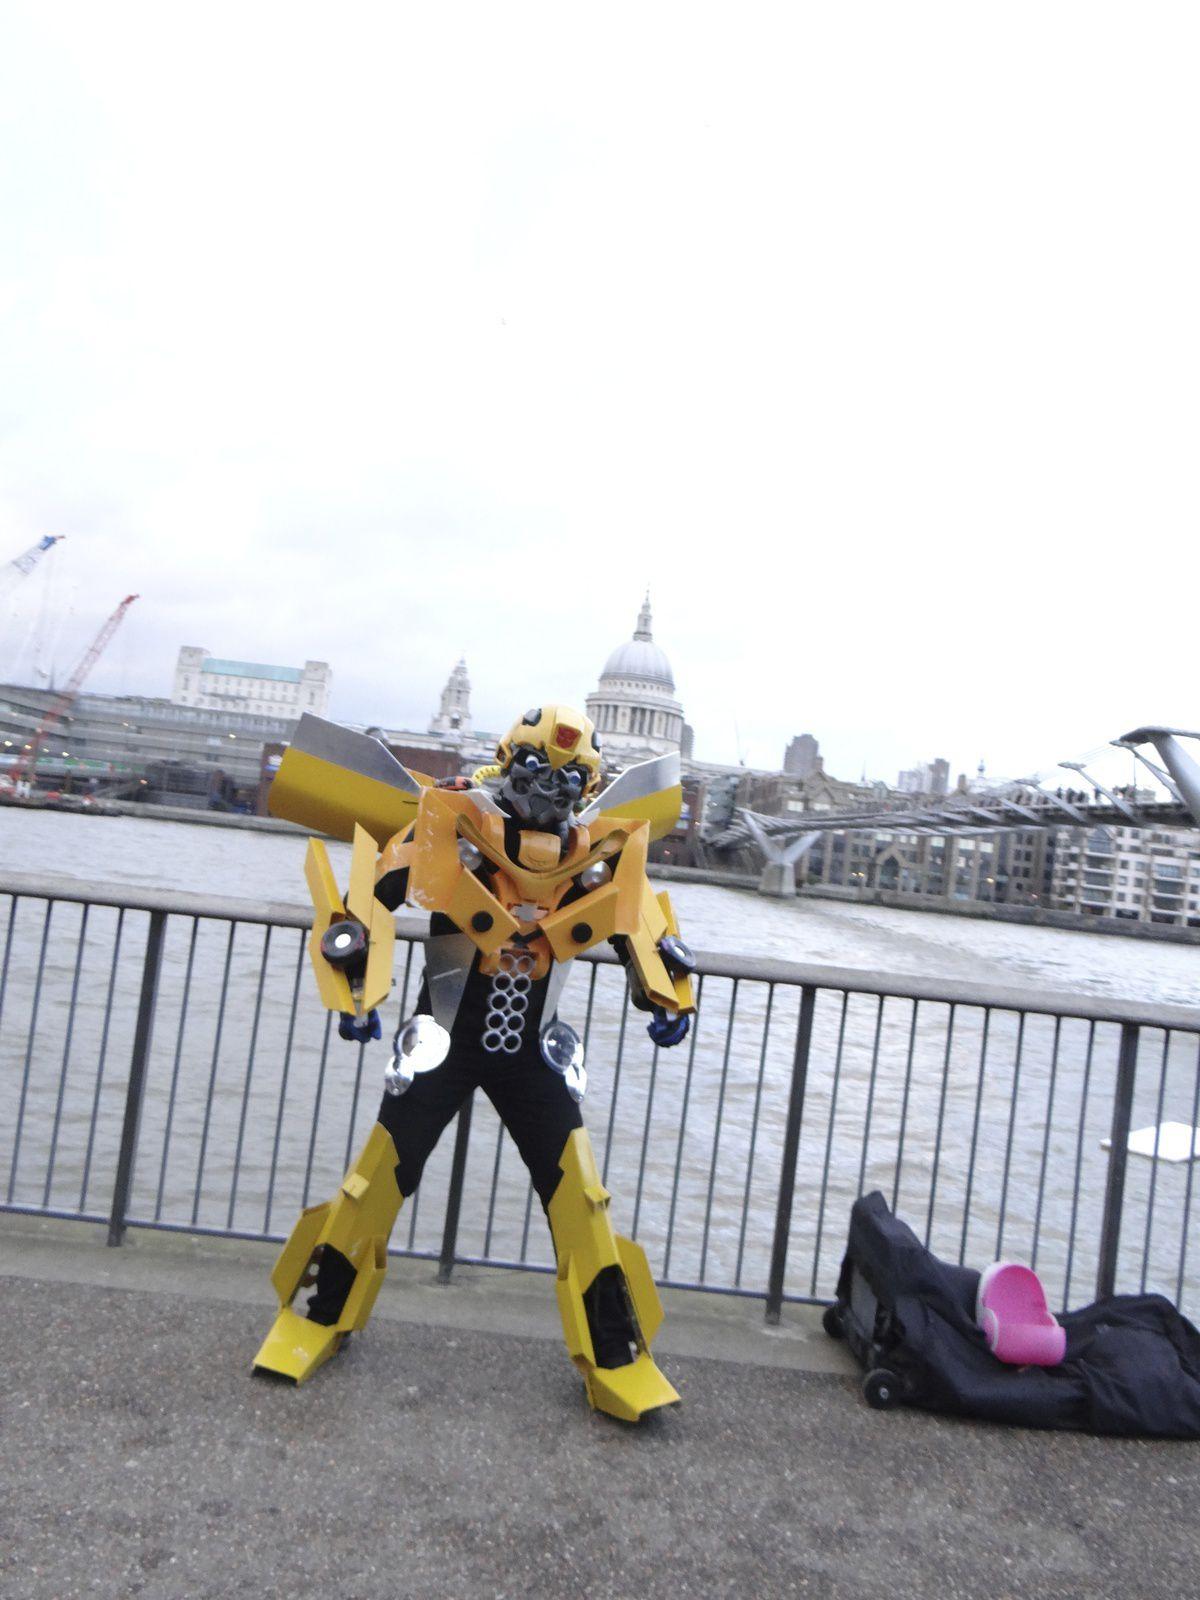 London: Tourism